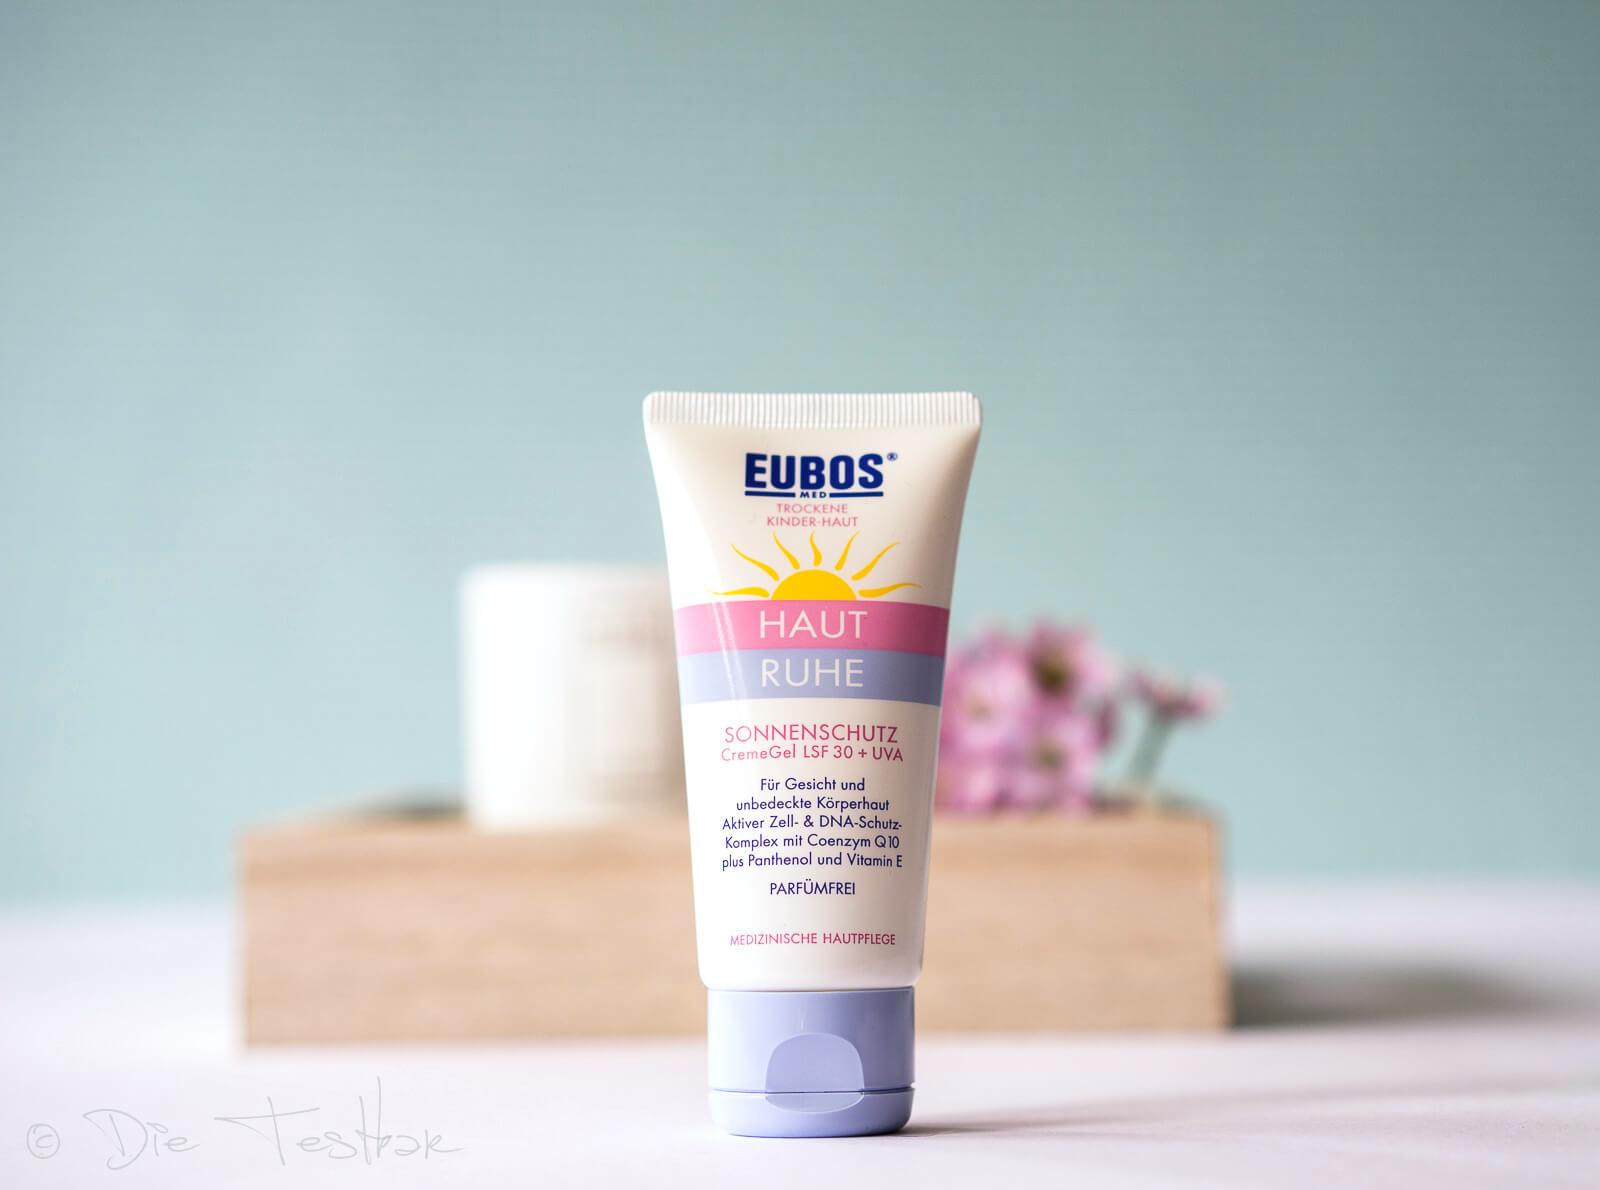 Haut Ruhe CremeGel LSF 30 + UVA von Eubos